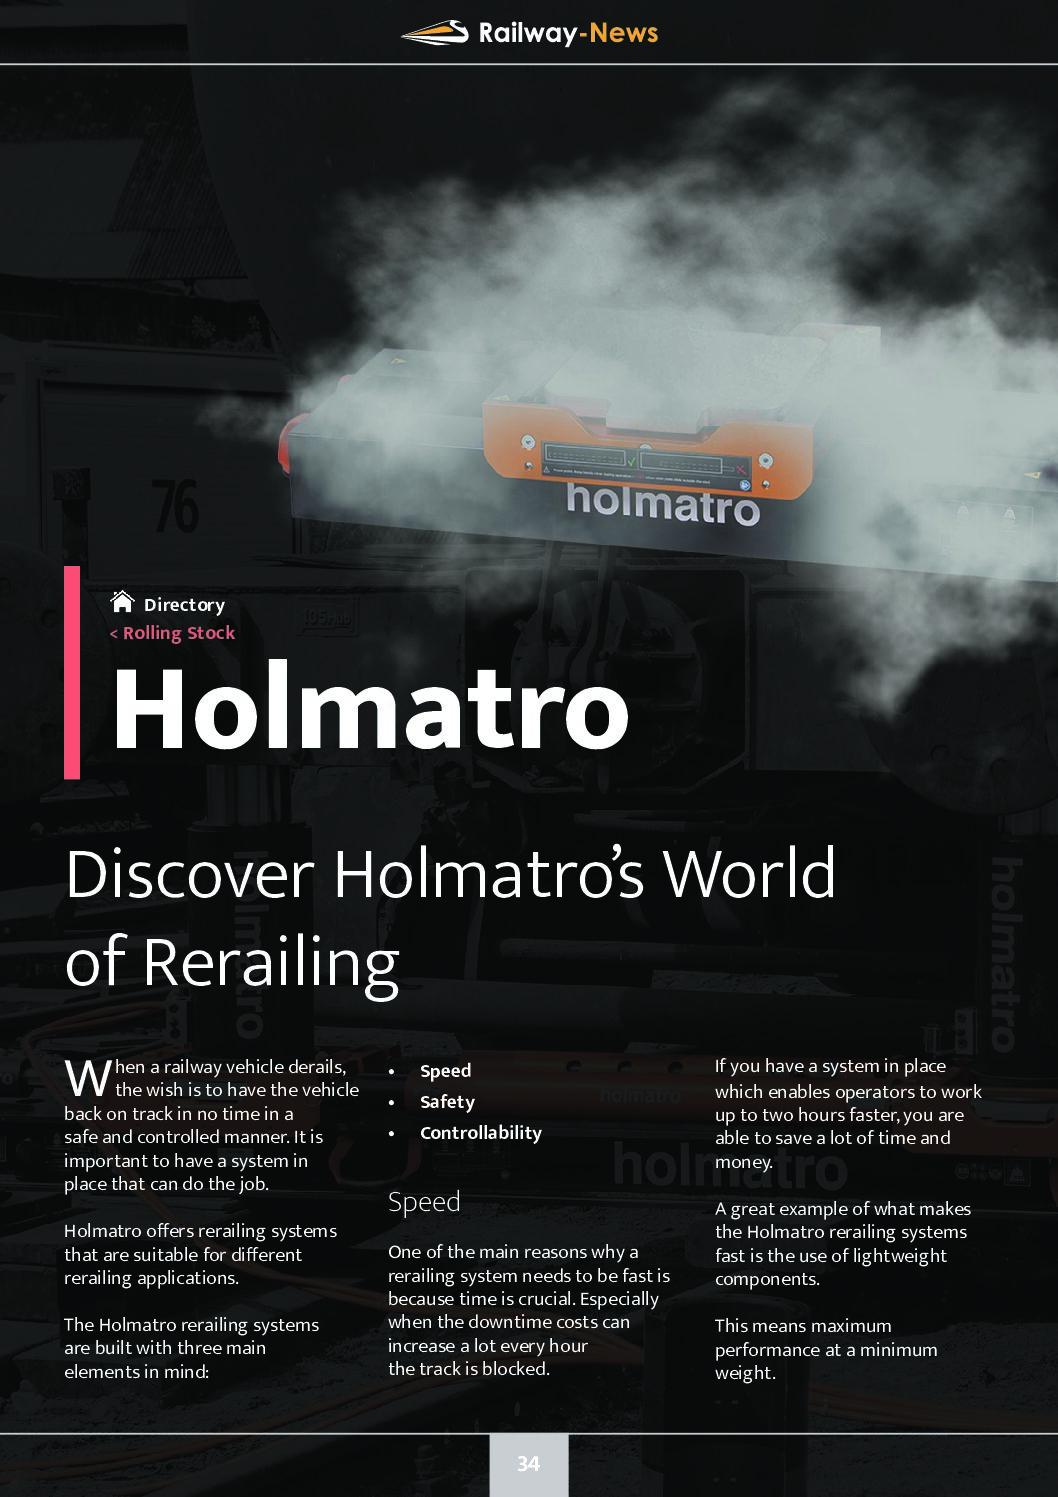 Holmatro – Discover Holmatro's World of Rerailing